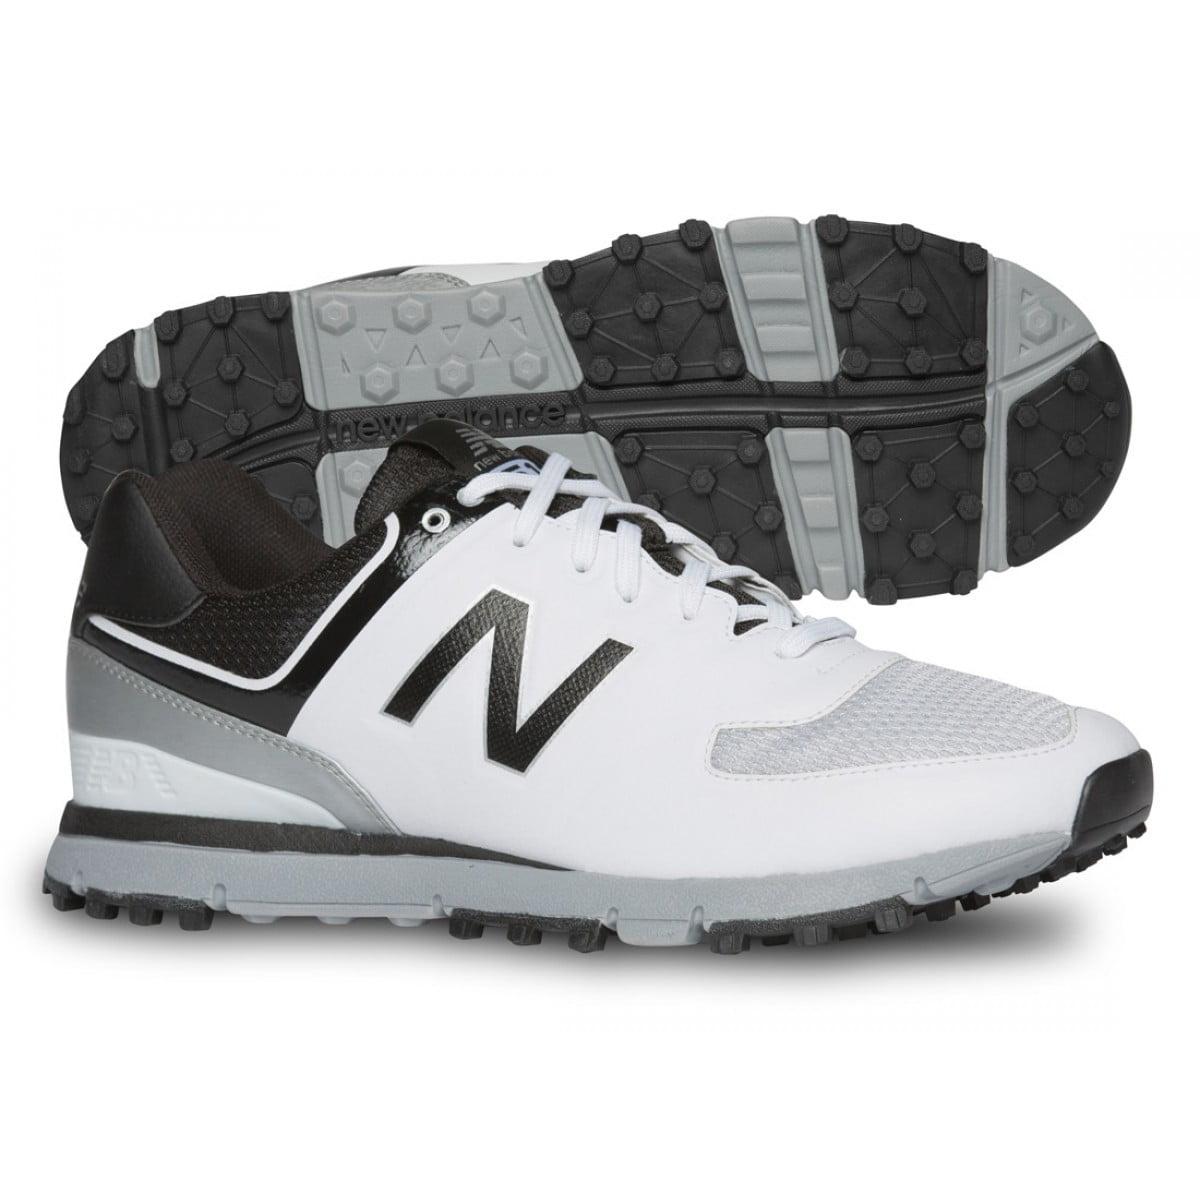 34fef73bfc74a New Balance Minimus NBG518 Golf Shoes - Walmart.com